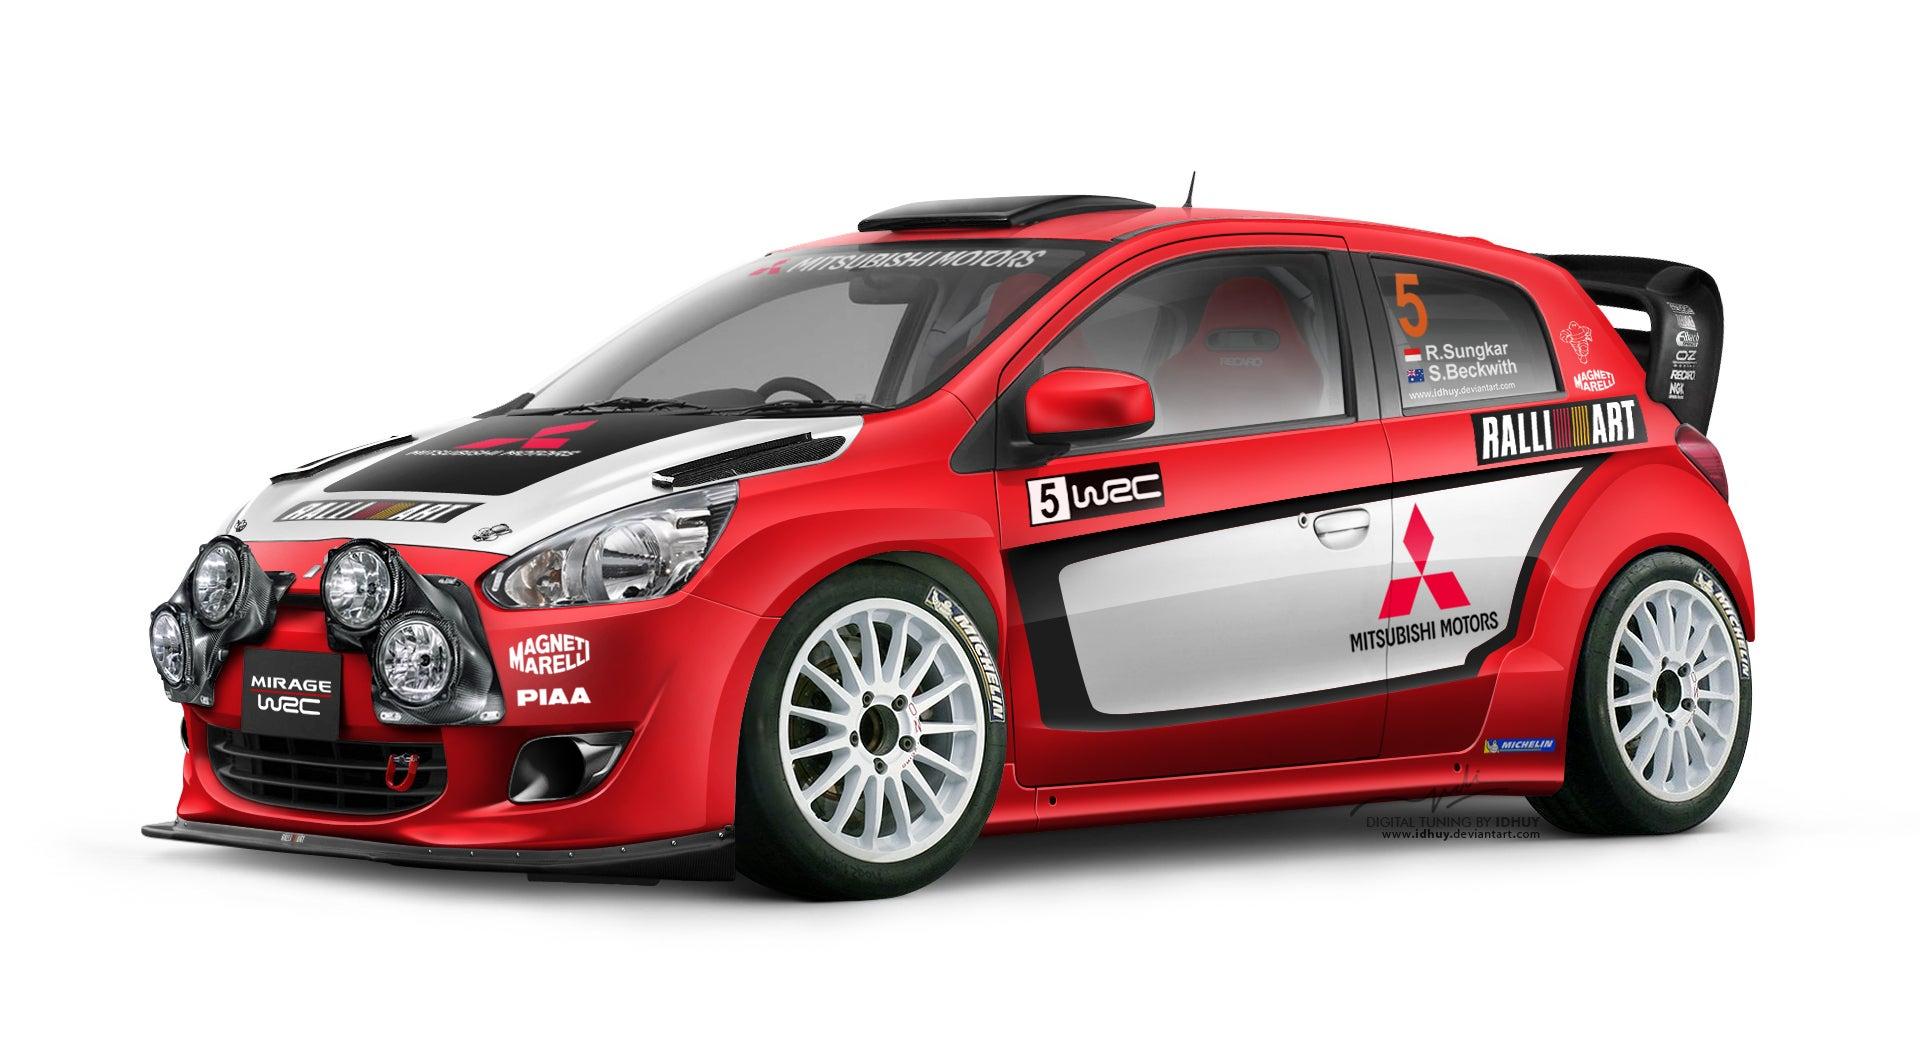 Who fancies a Mitsubishi Mirage WRC Ralliart?